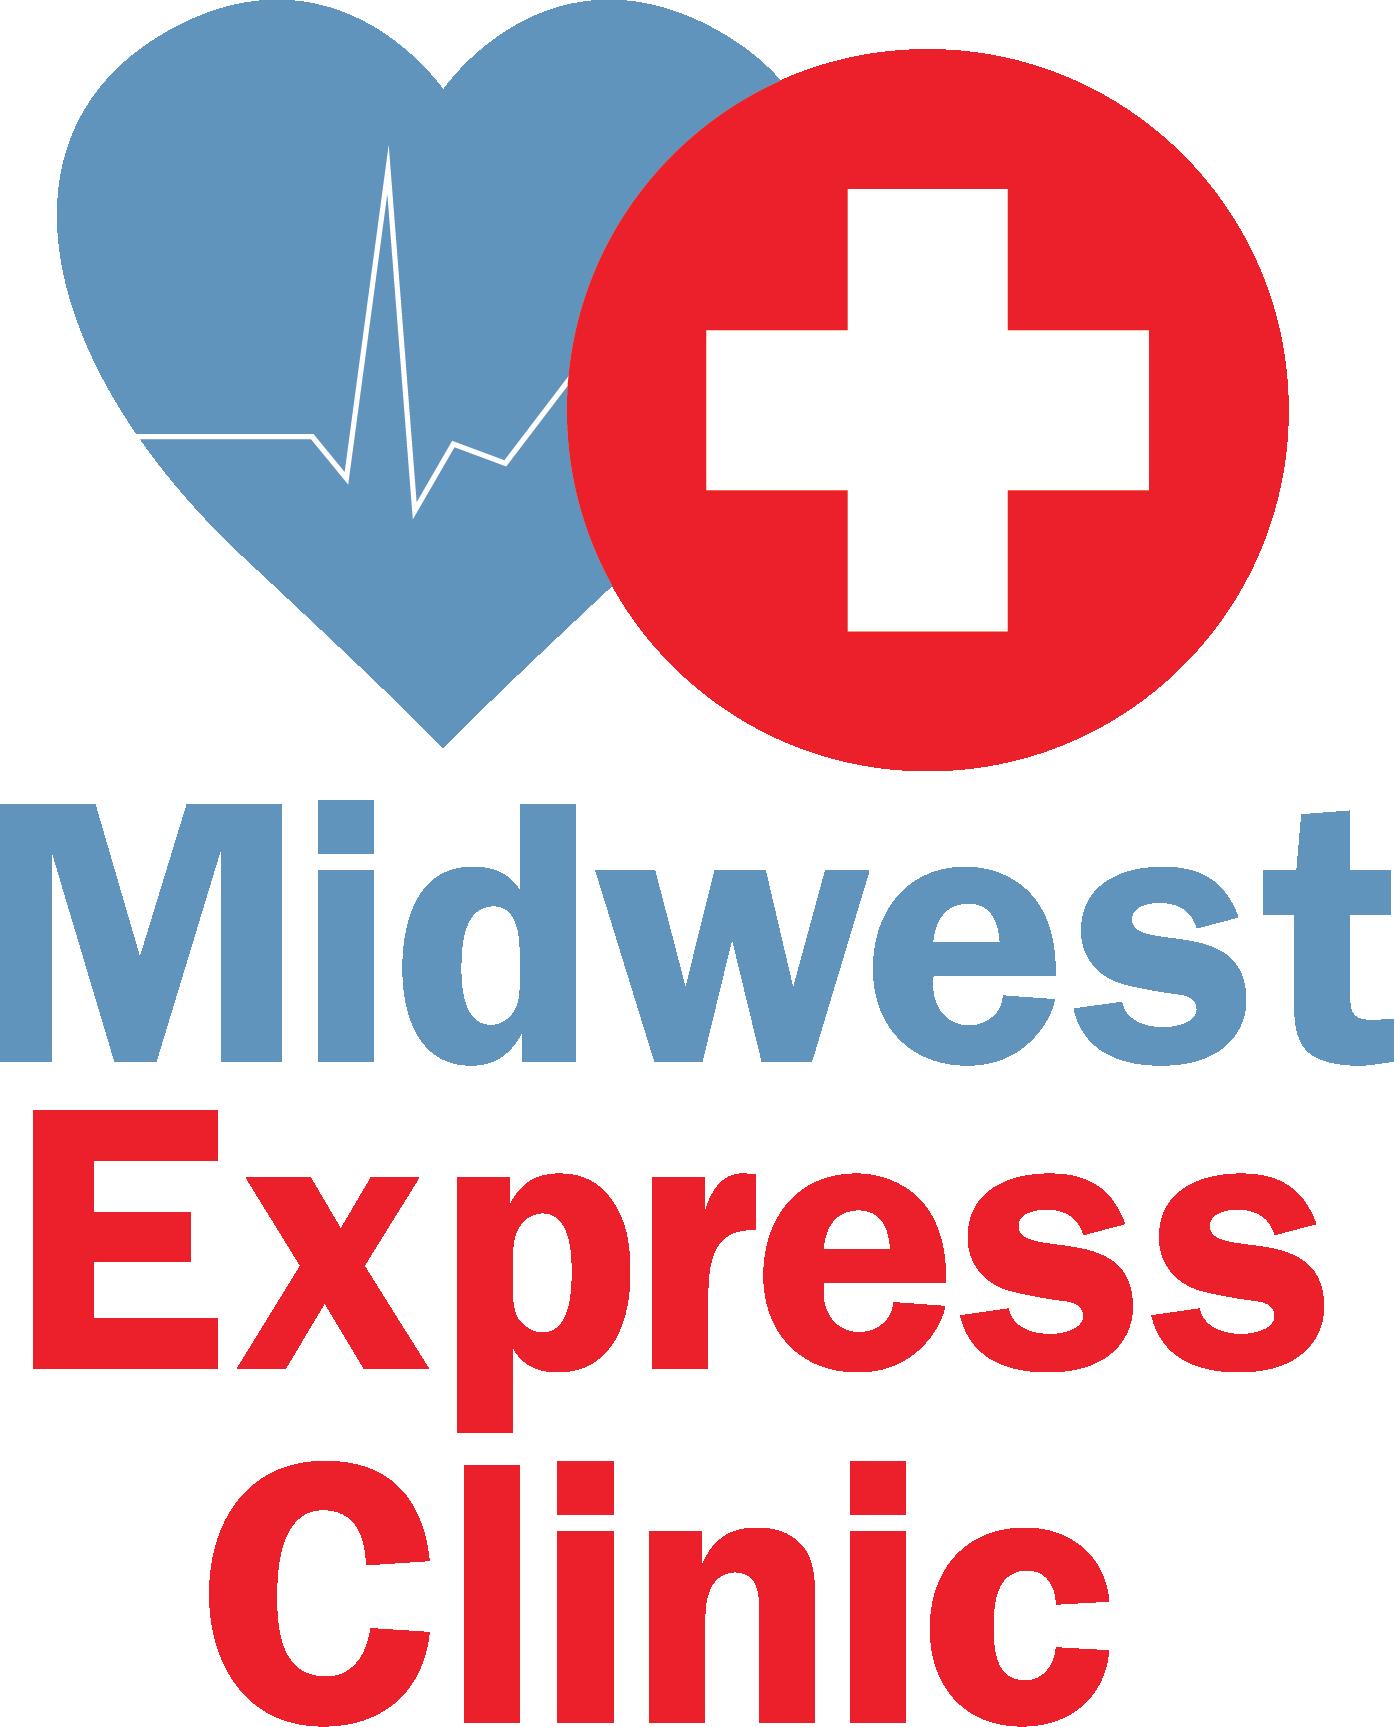 Midwest Express Clinic - Merrillville Logo